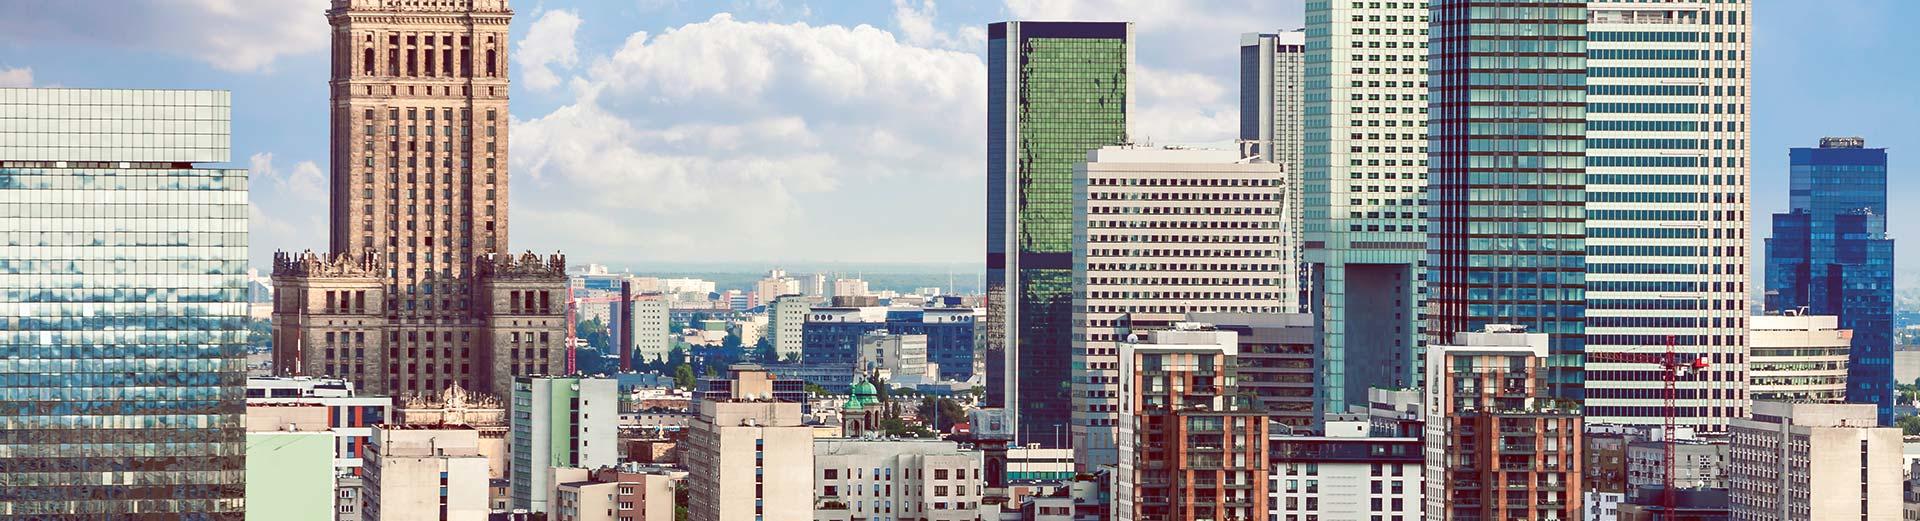 Targi mieszkaniowe Warszawa